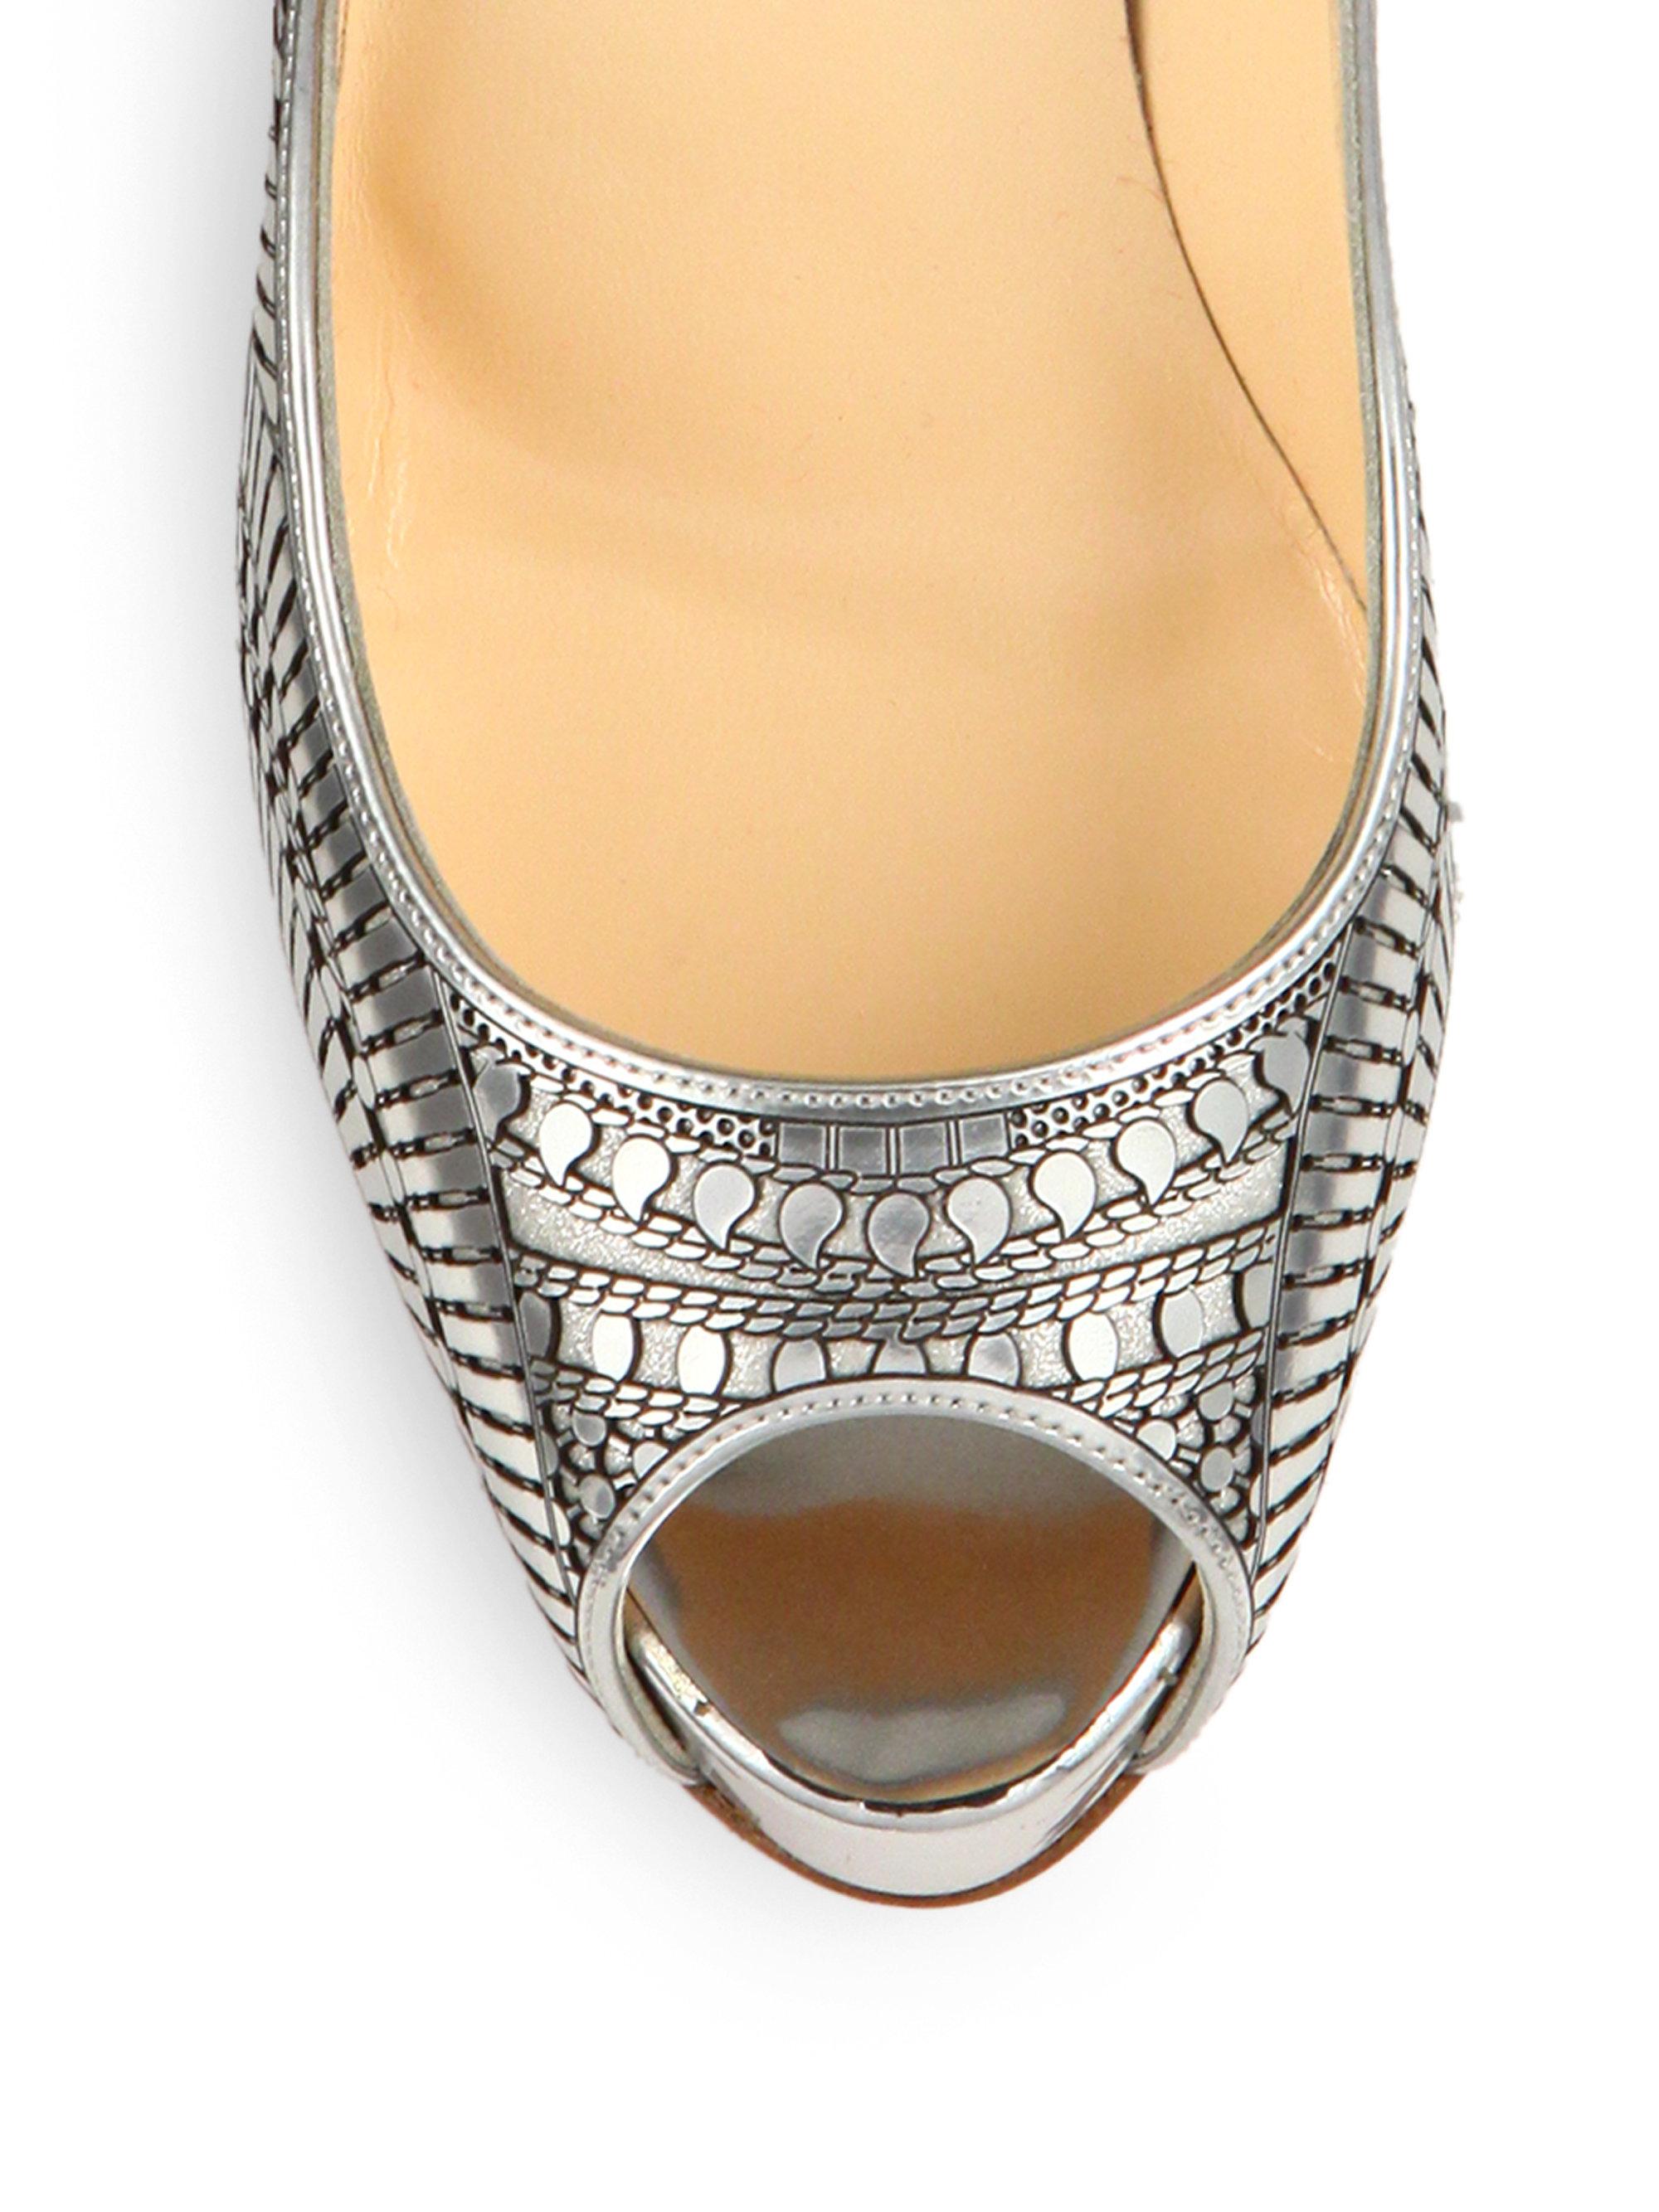 where can i buy louboutin replicas - Christian louboutin Suellena Laser-cut Metallic Leather Peep-toe ...